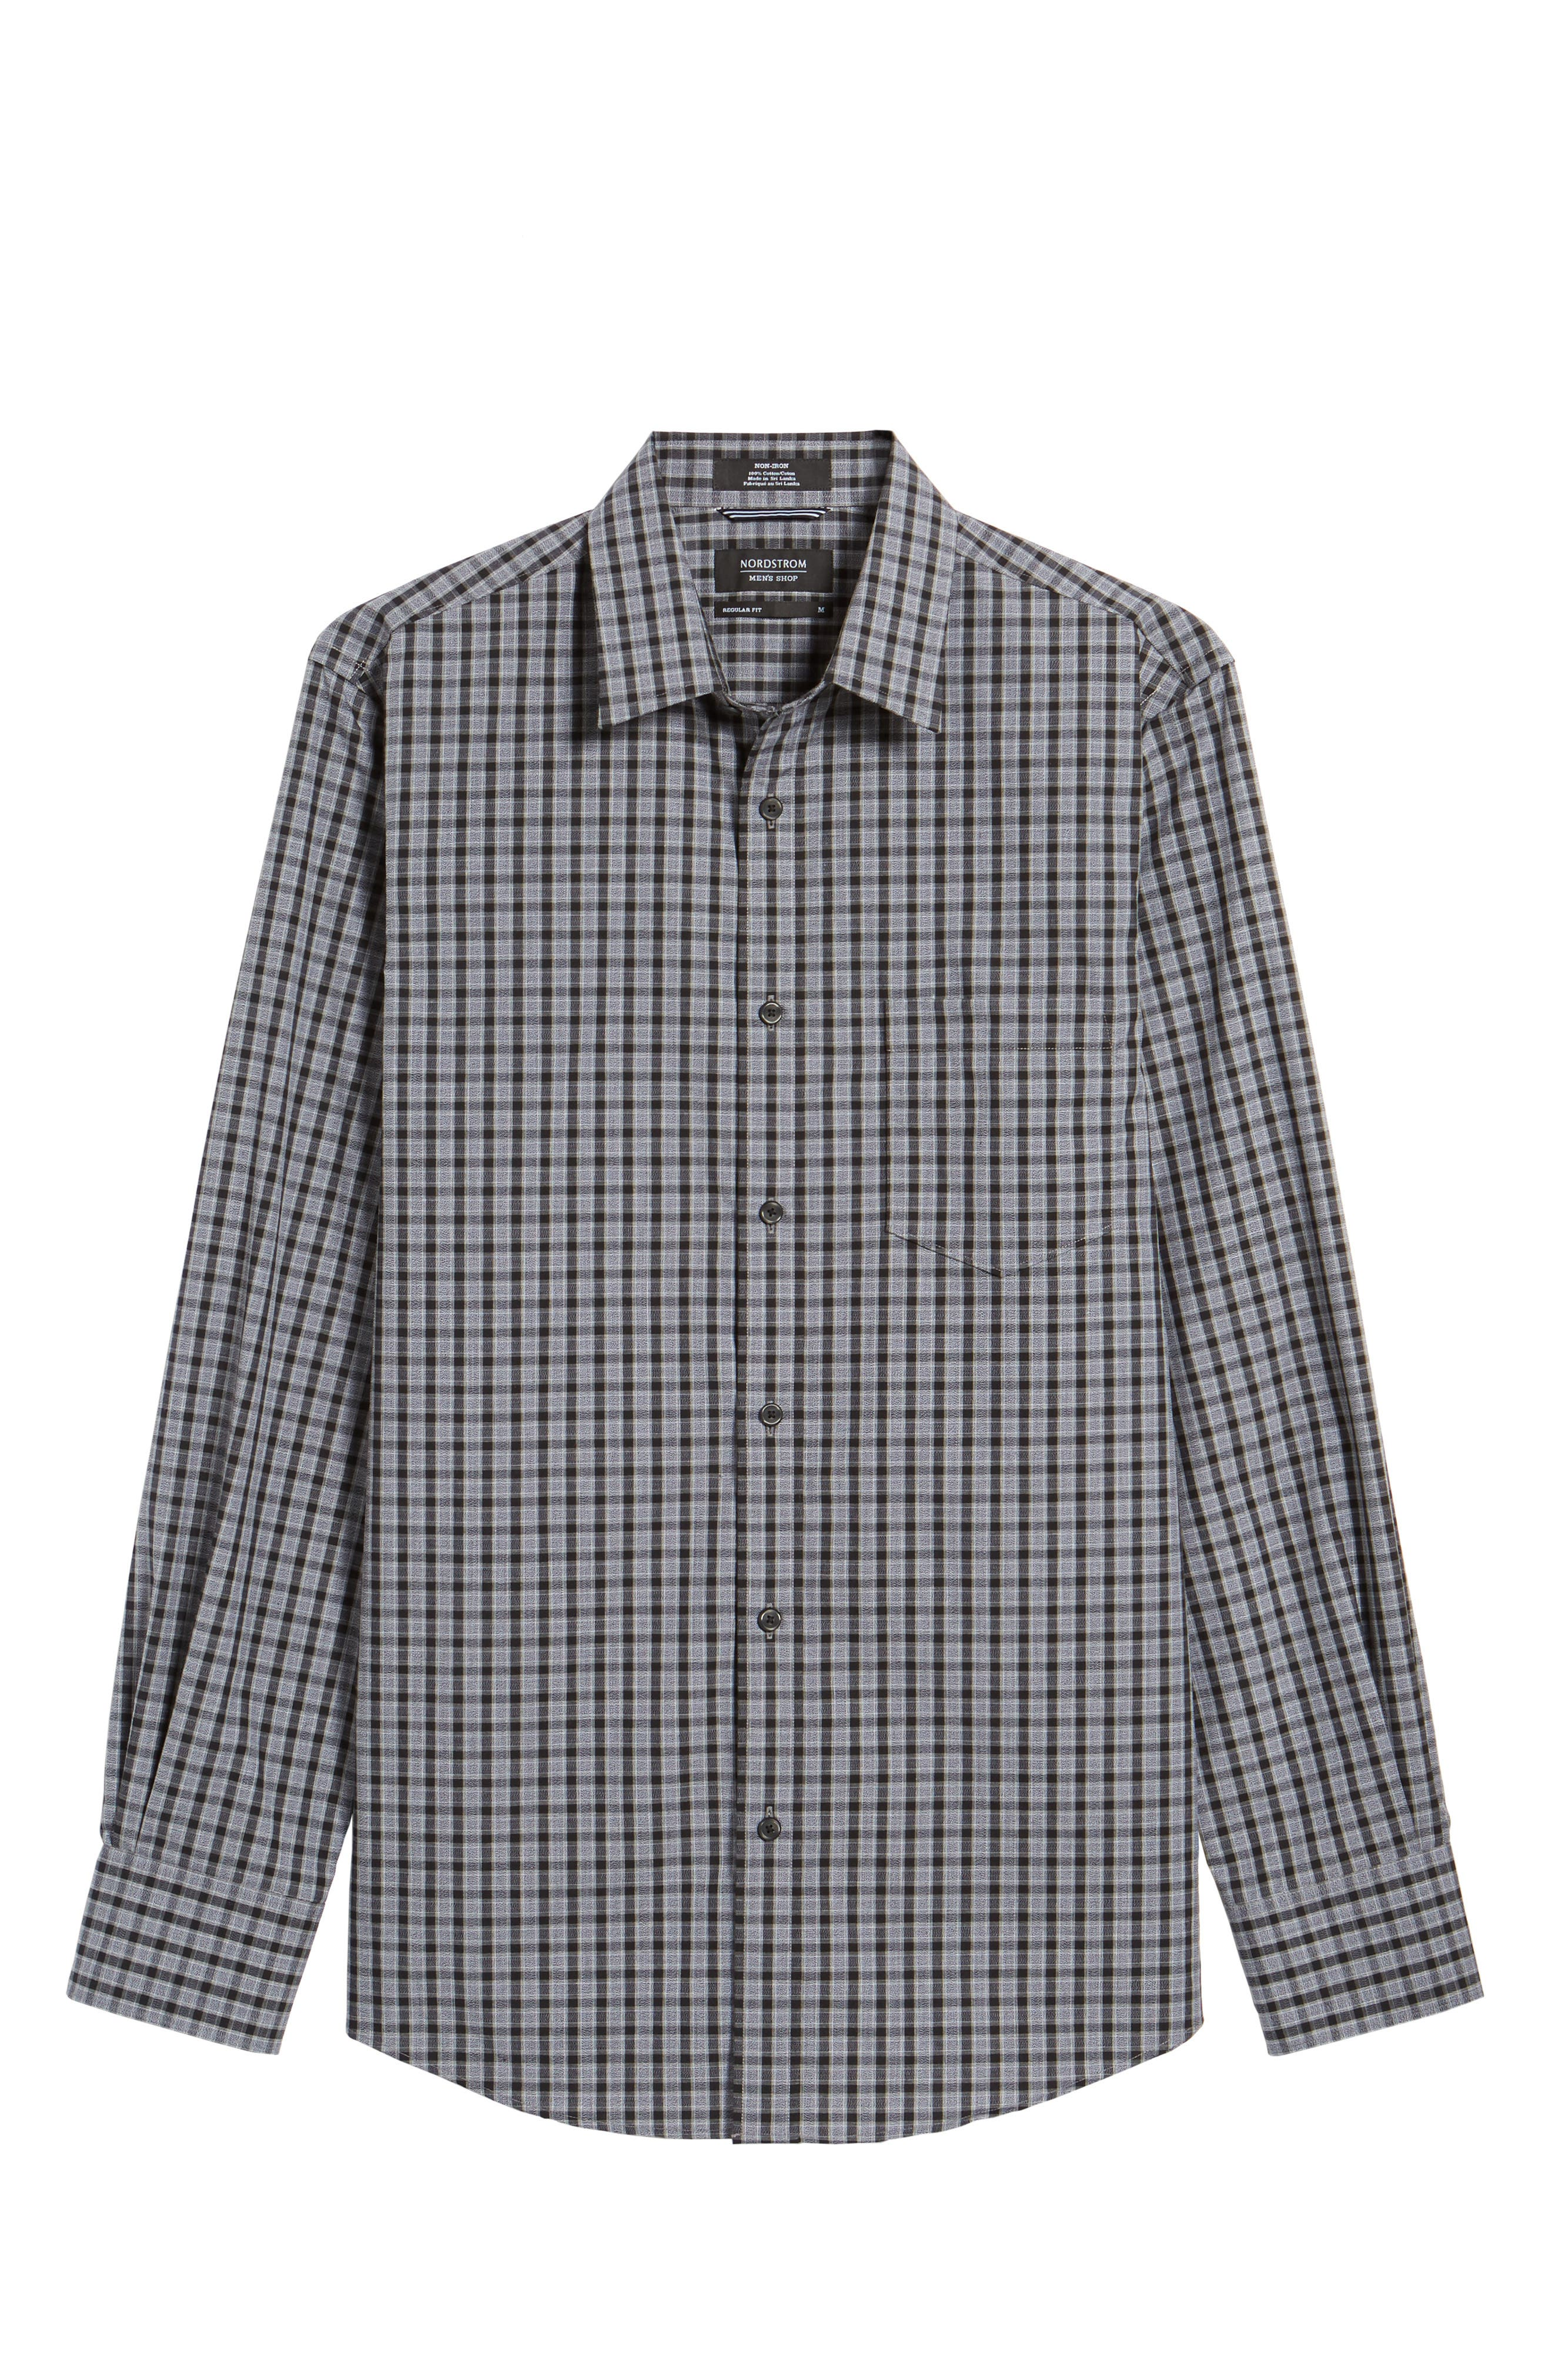 Regular Fit Non-Iron Check Sport Shirt,                             Alternate thumbnail 6, color,                             Grey Shade Black Heather Check